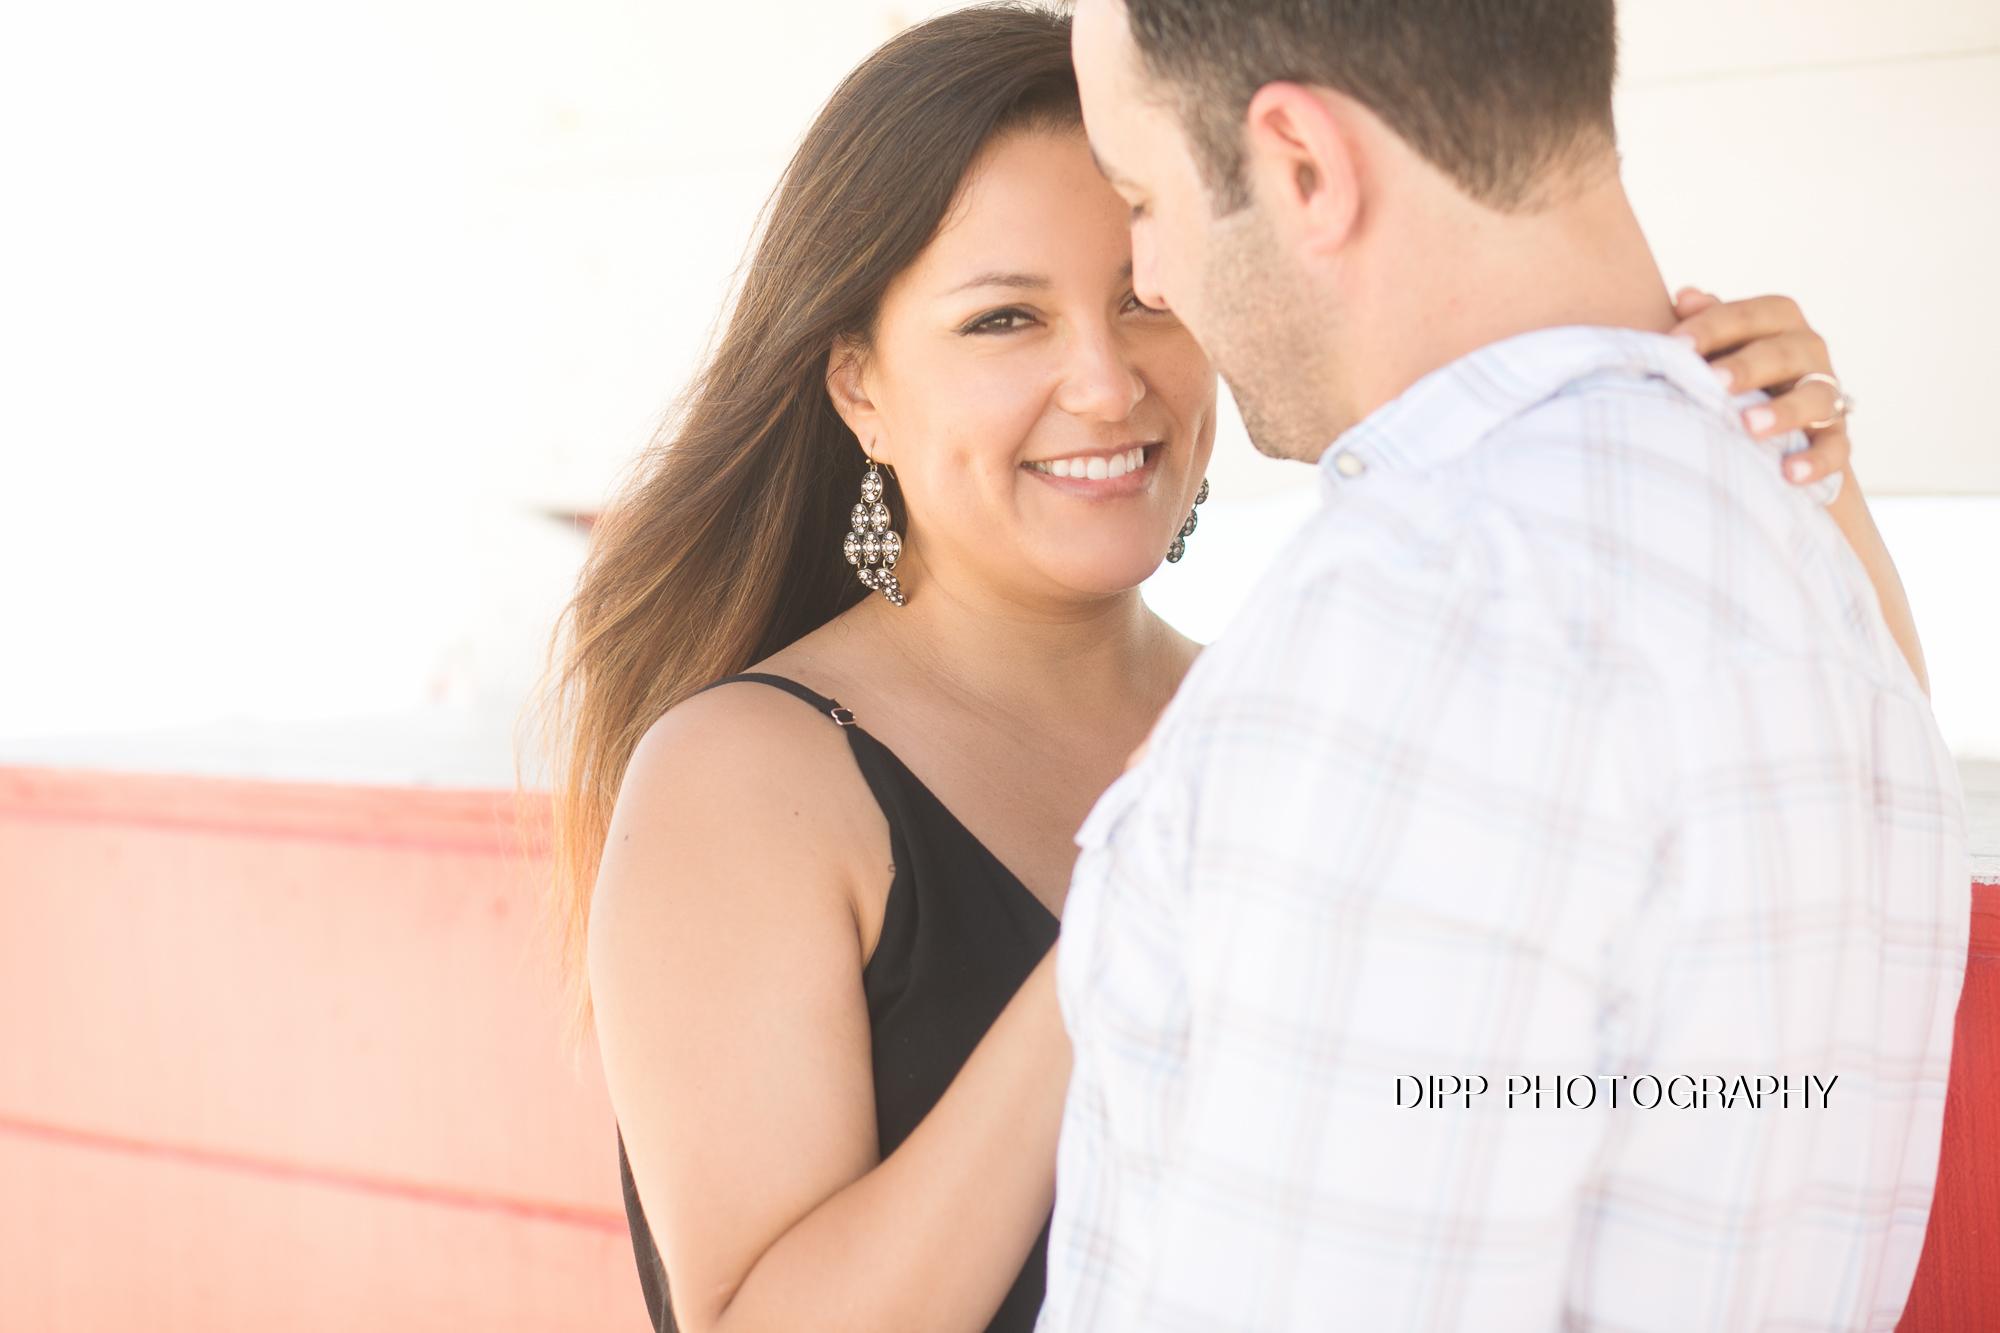 Dipp_2016 Brandon & Sara Mini Engagement Session-124-Edit